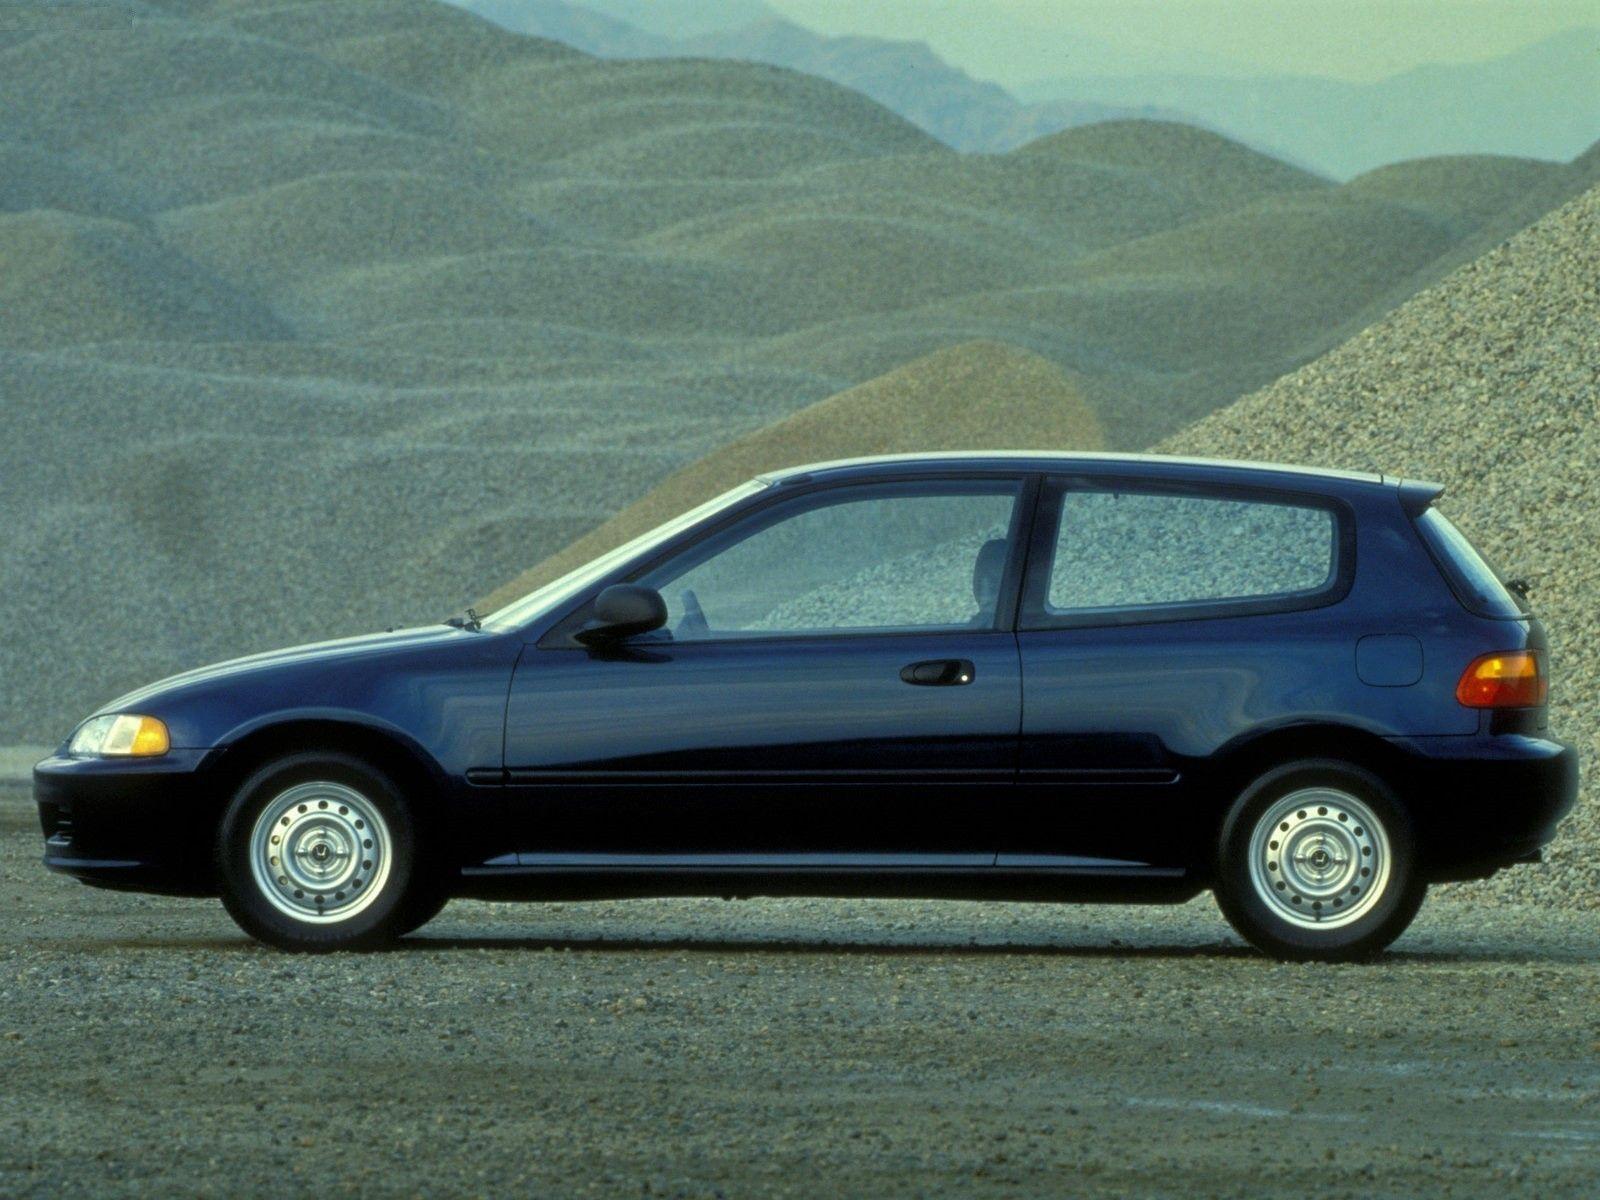 Honda Civic Cx Hatchback North America Eh2 1991 95 Civic Hatchback Honda Civic Hatchback Honda Civic